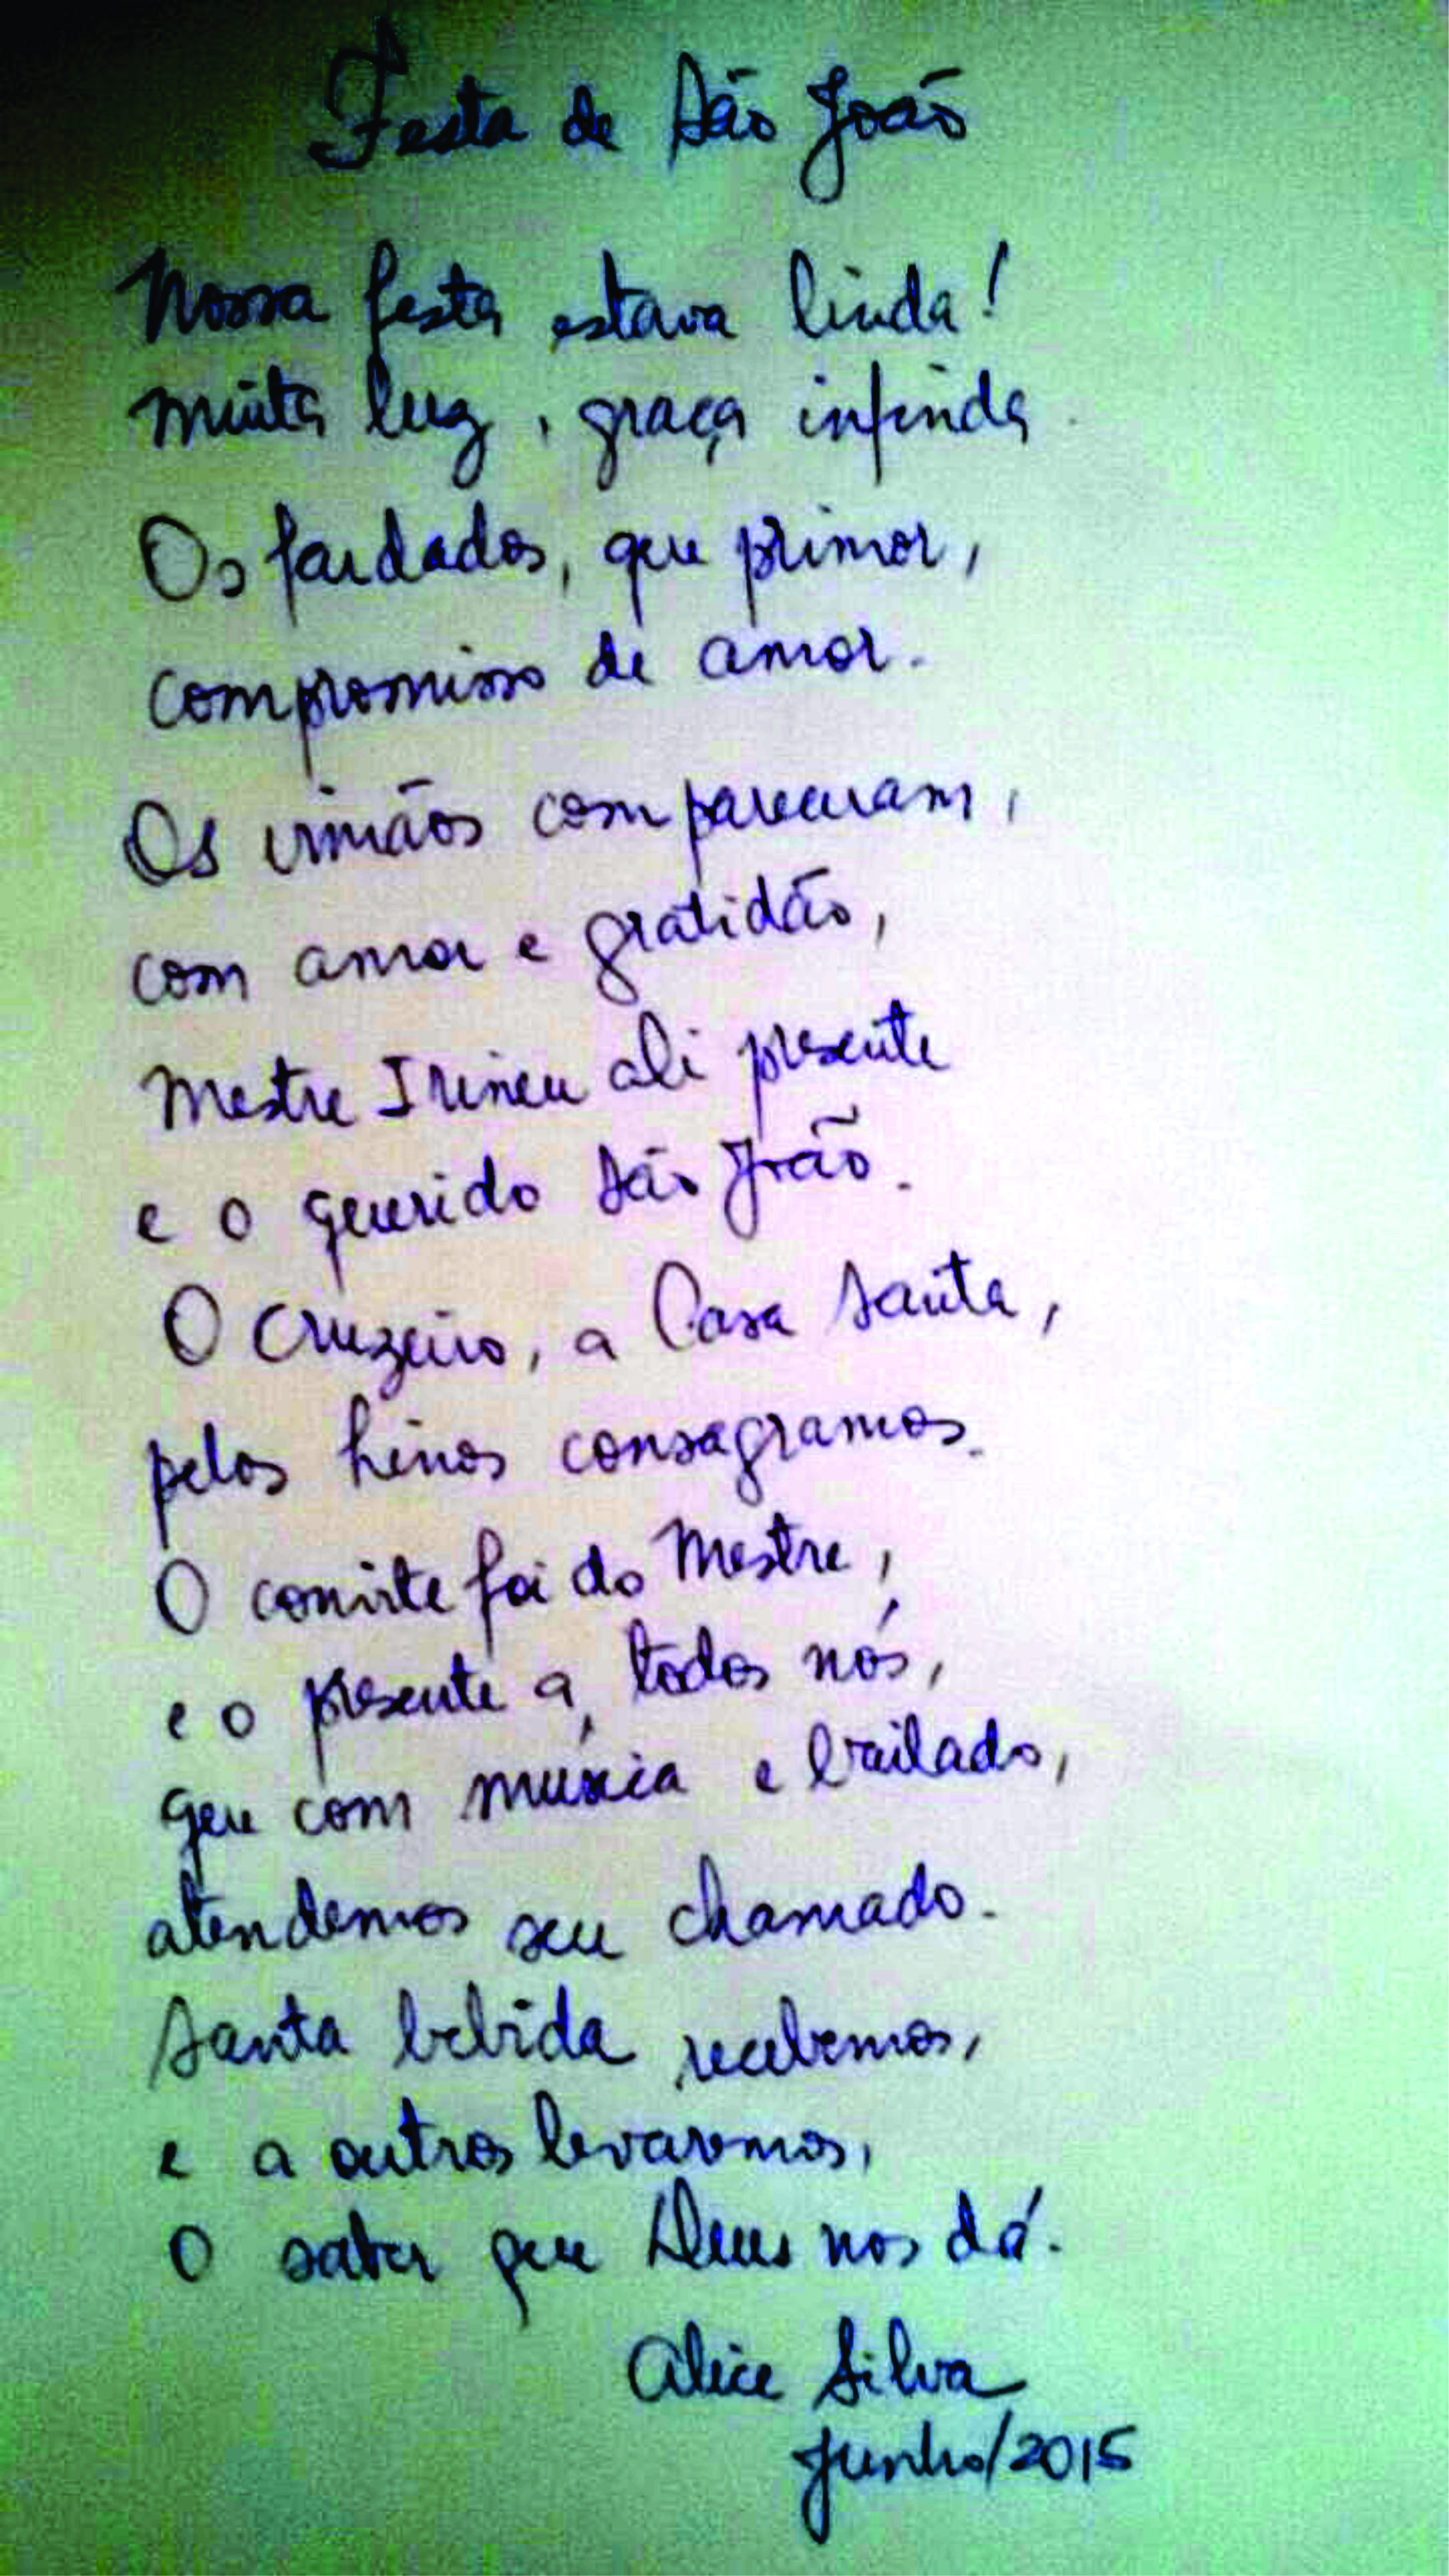 Poema da Alice editado.jpg